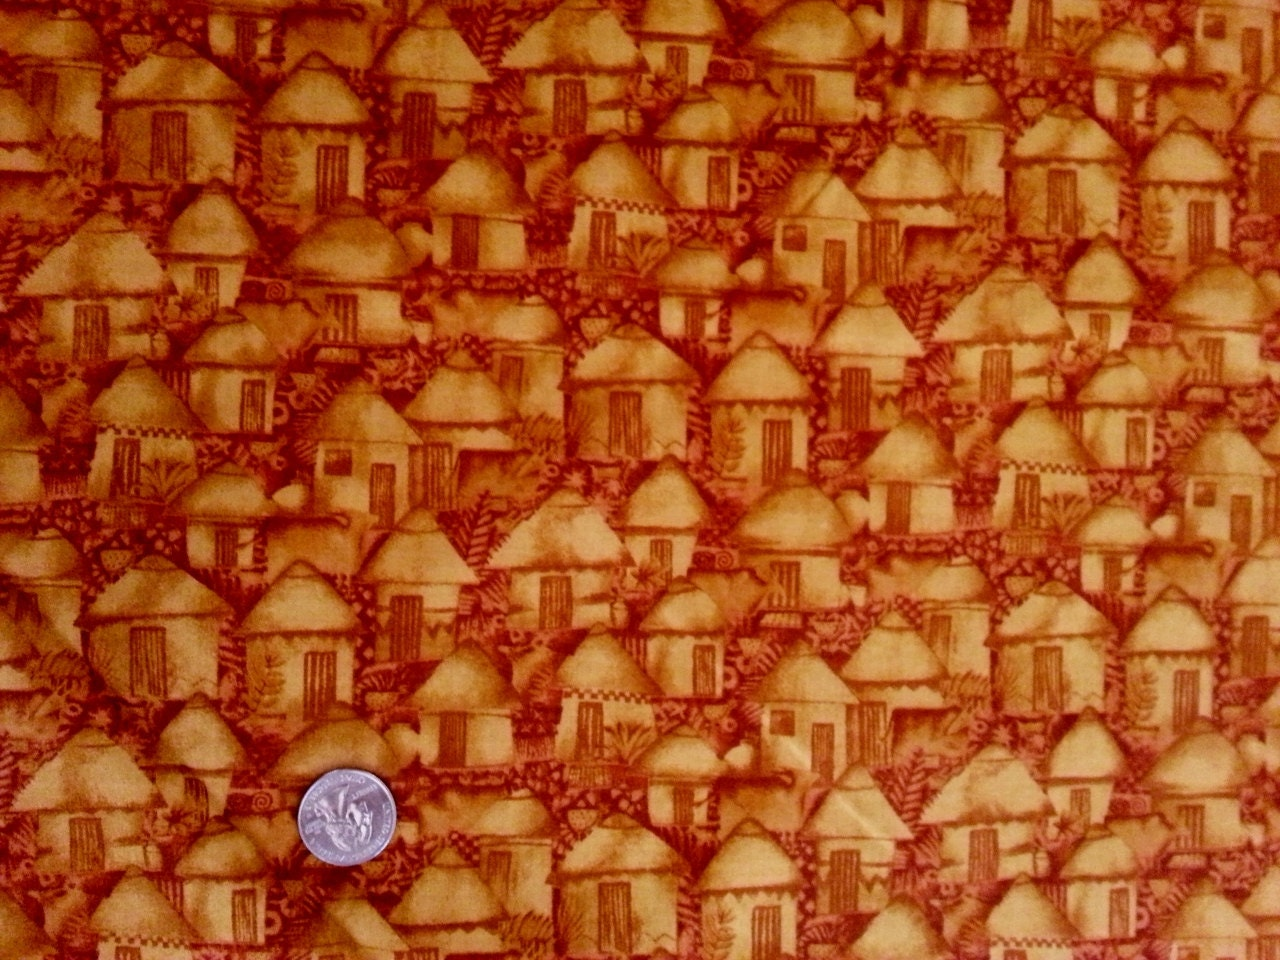 Cranston QuiltShop VIP Yellow Tonal Huts Village Cotton Fabric